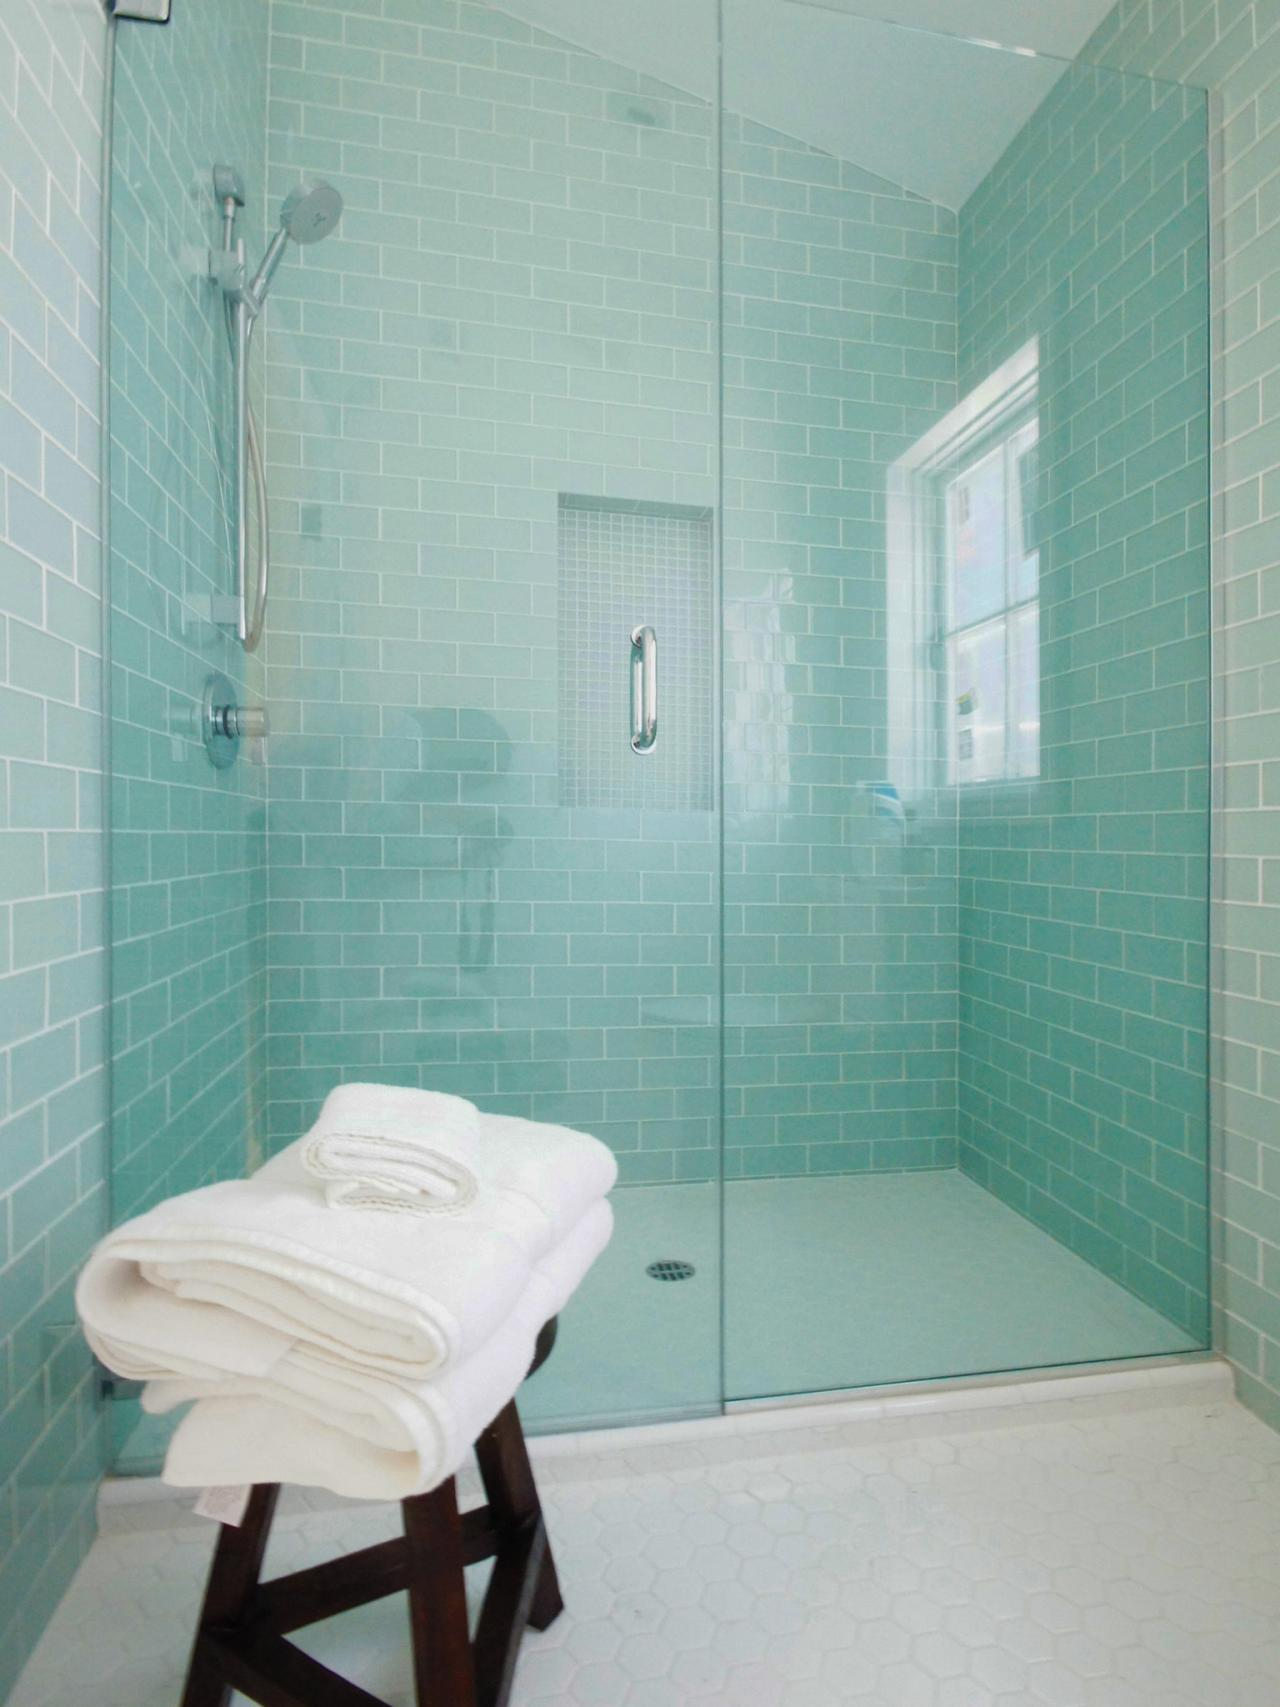 DP_Courtney-Blanton-modern-mint-bathroom